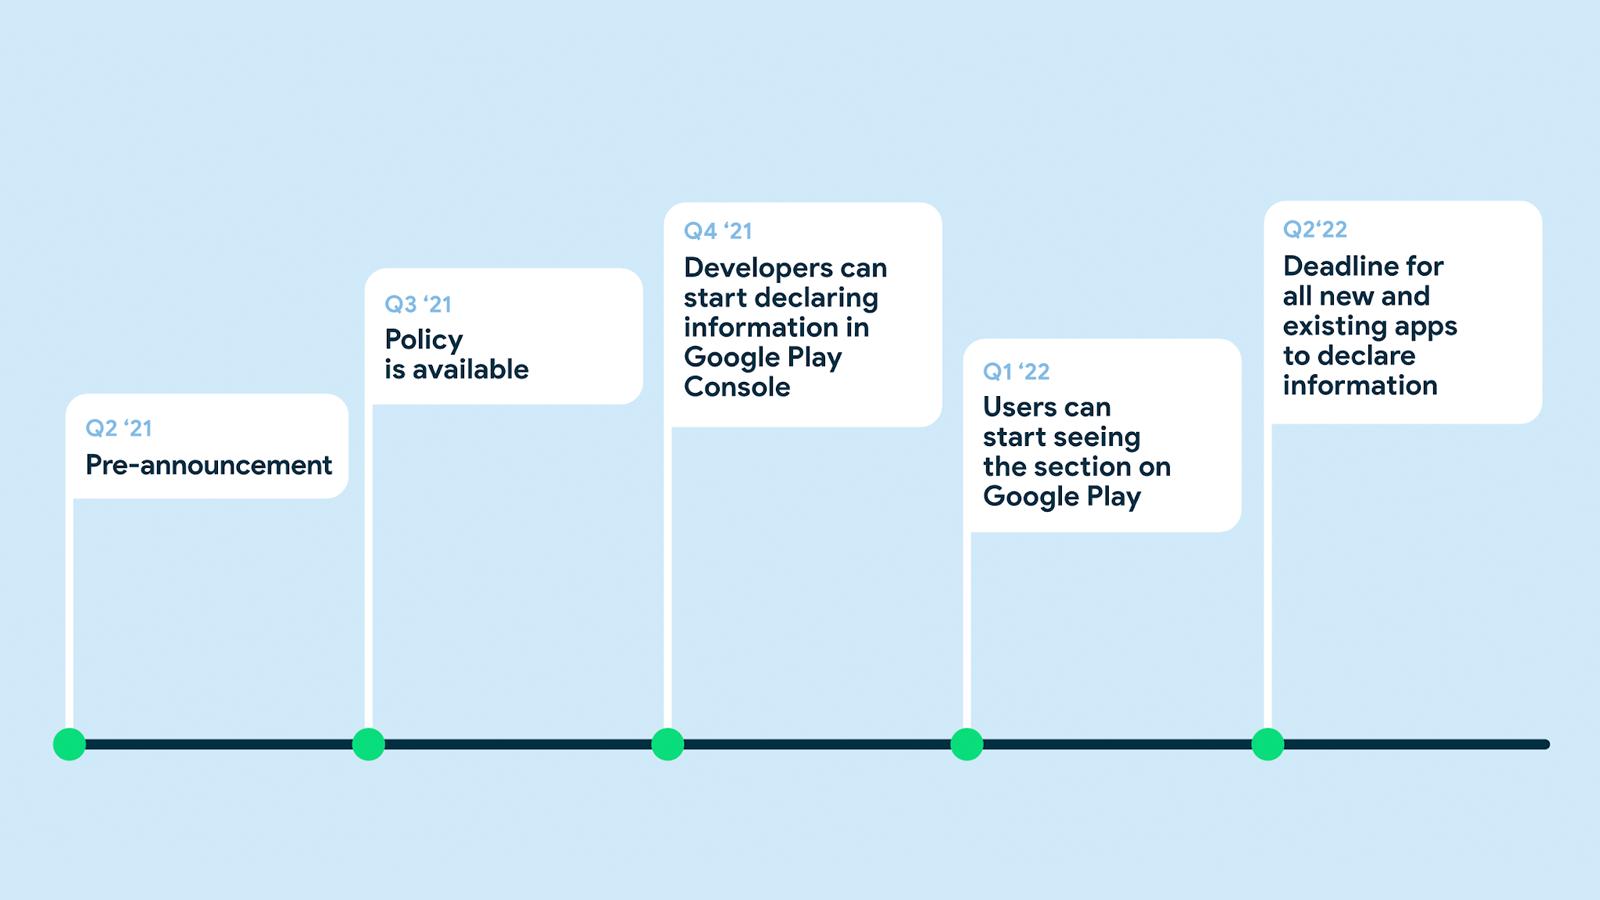 Google's implementation timeline for safety section